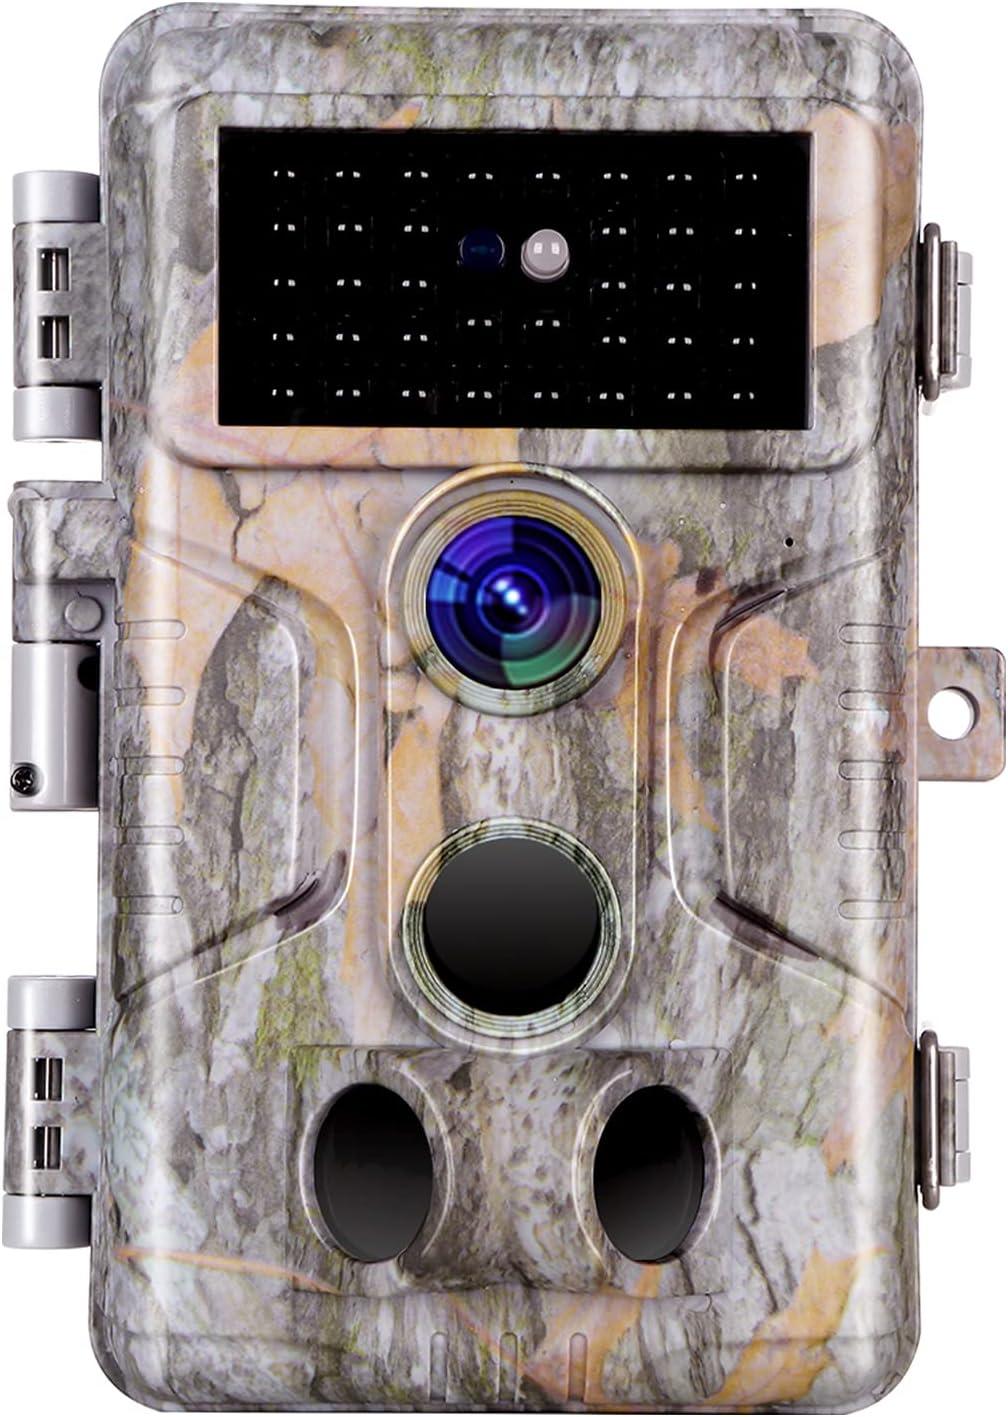 BlazeVideo Camo Stealth Outdoor Game Vi 1296P Trail Cameras Ranking TOP7 24MP Ranking TOP2